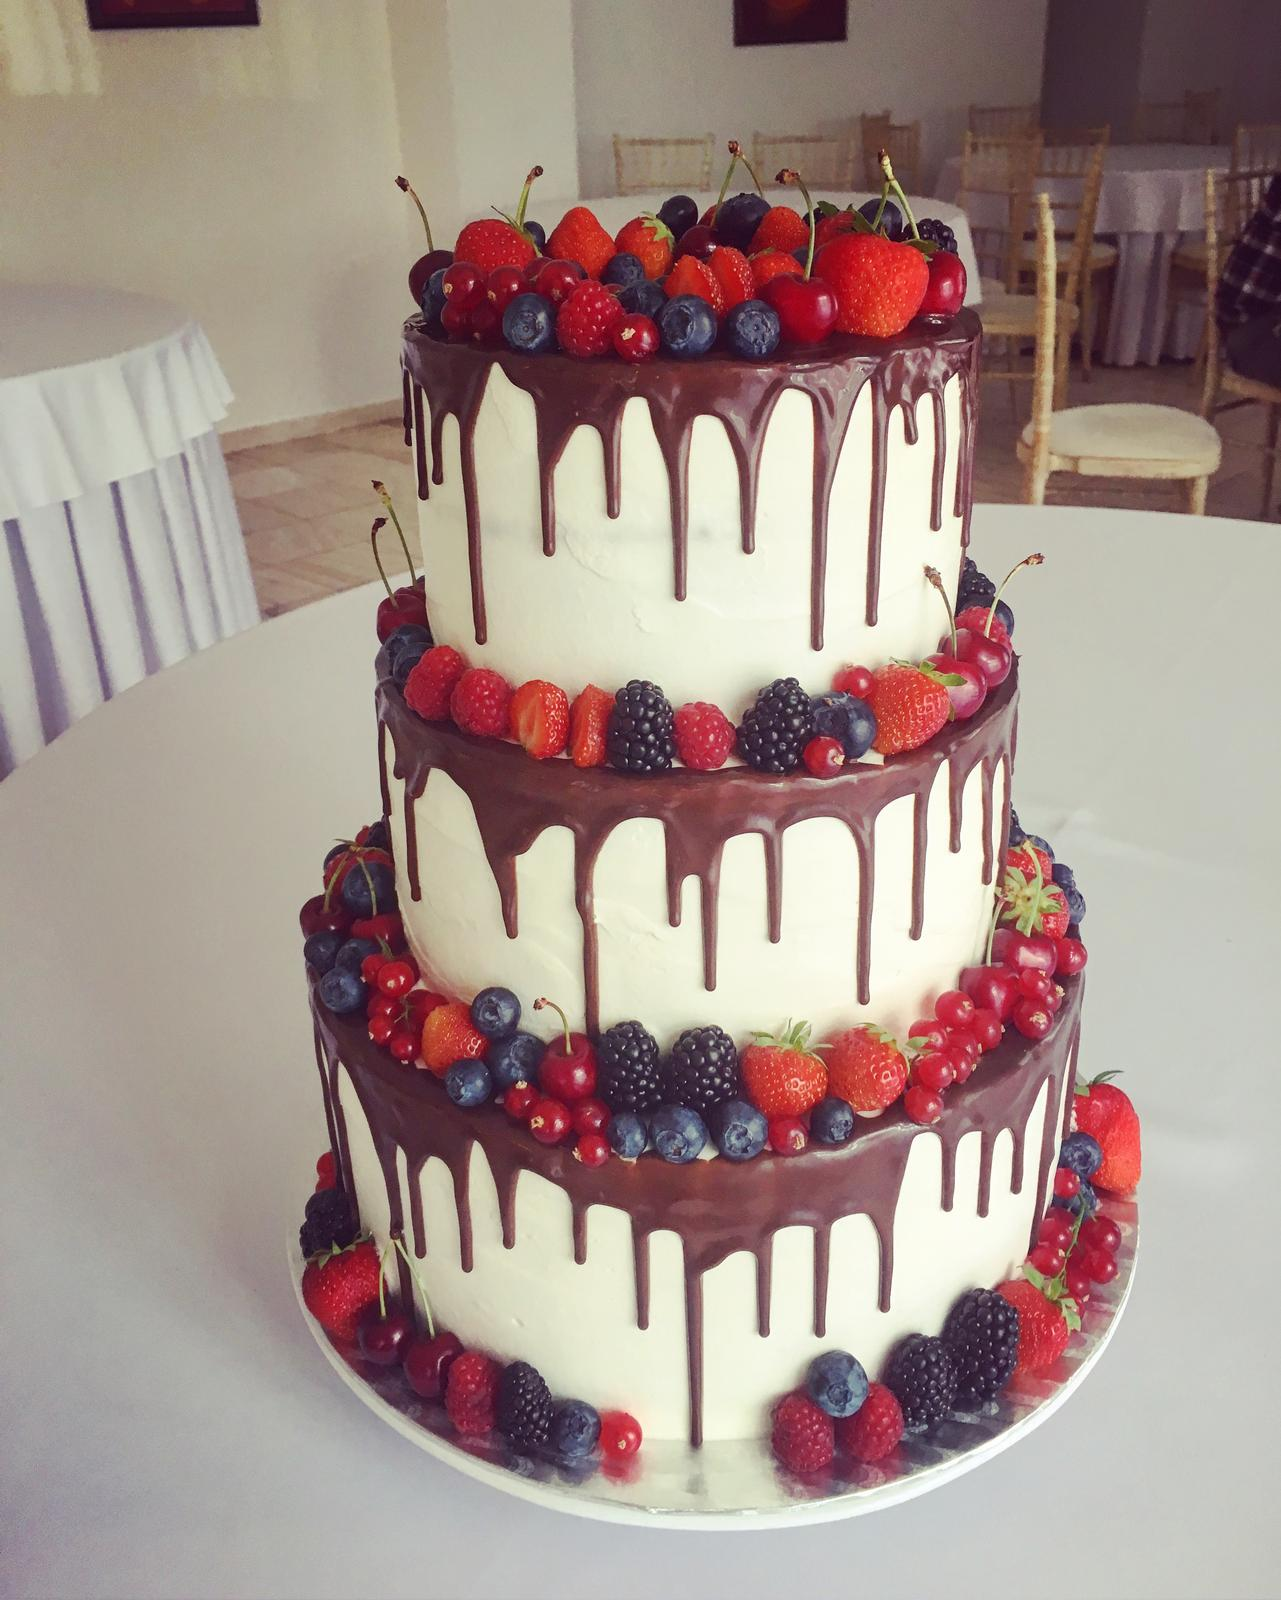 Svadobné torty od Castel Cakes & Sweets - Realizácia: http://castel.sk/cakes-sweets/